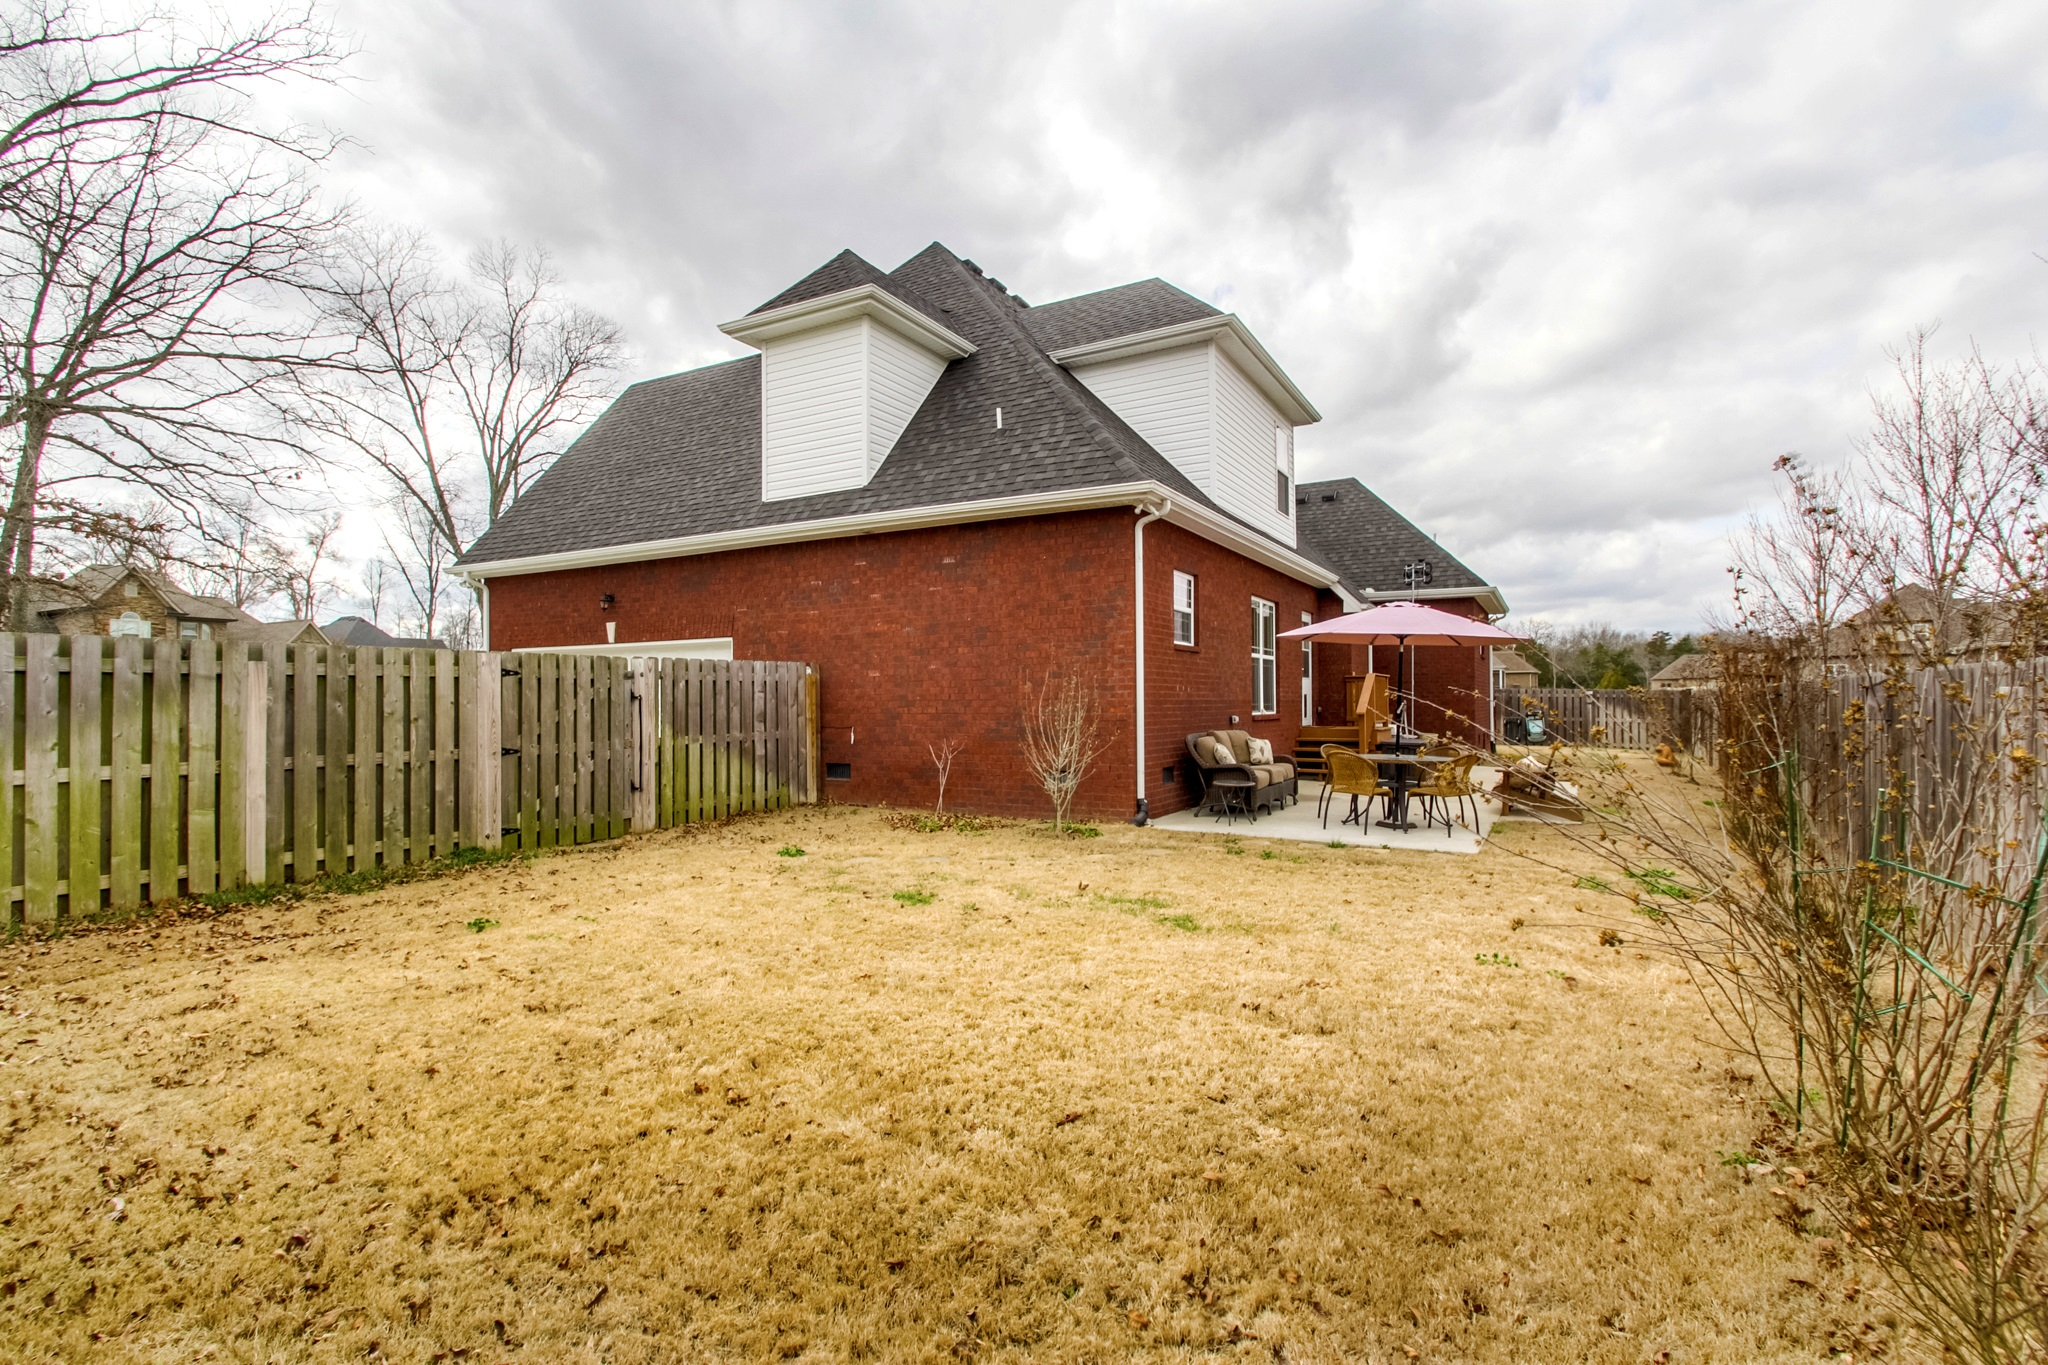 108 Sweet Bay Ct Murfeeesboro, TN(LOW-RES) (43 of 50)